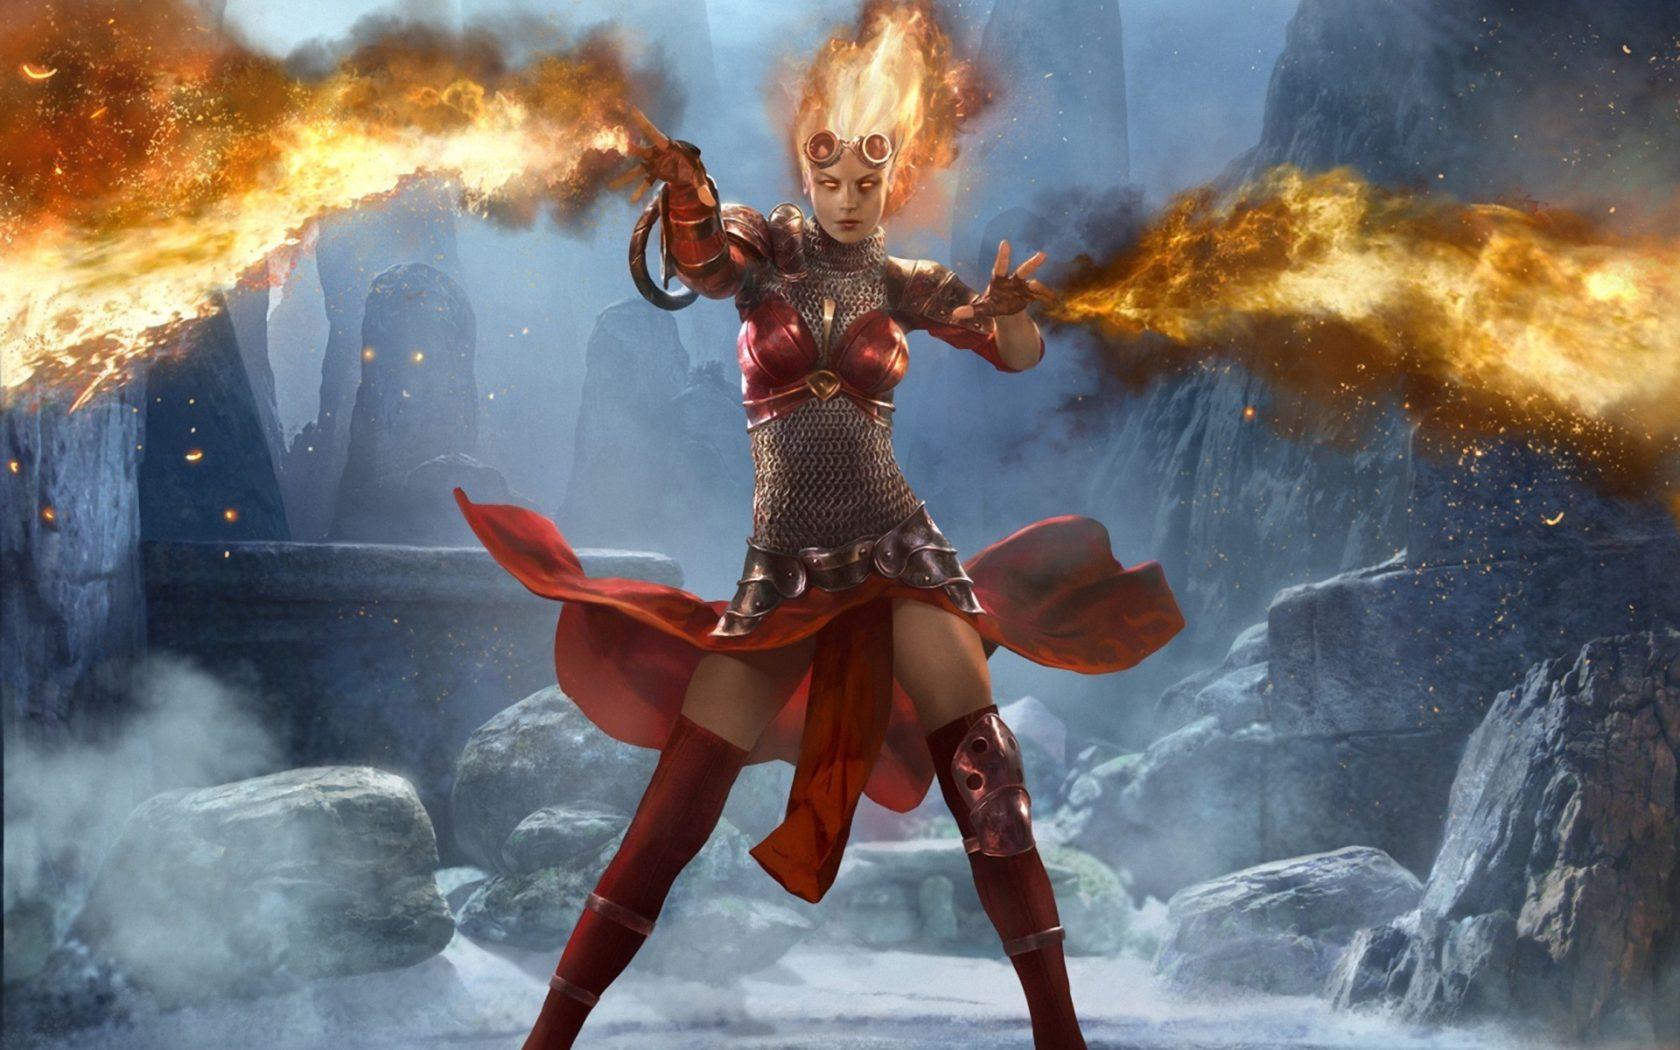 Warrior Girl Wallpaper Magic The Gathering Fire Armor Games Girl Wallpapers13 Com